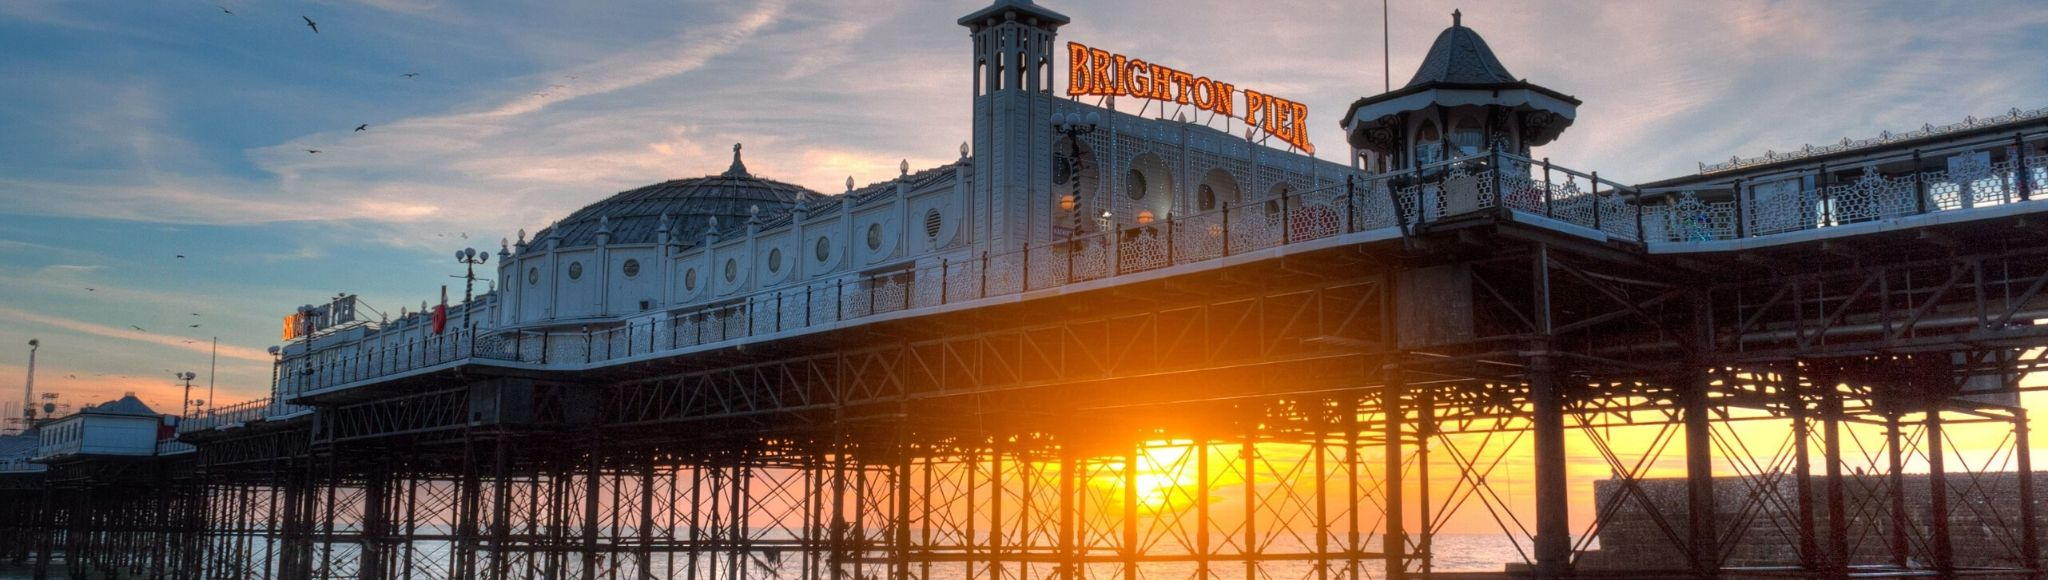 sunset through Brighton Pier